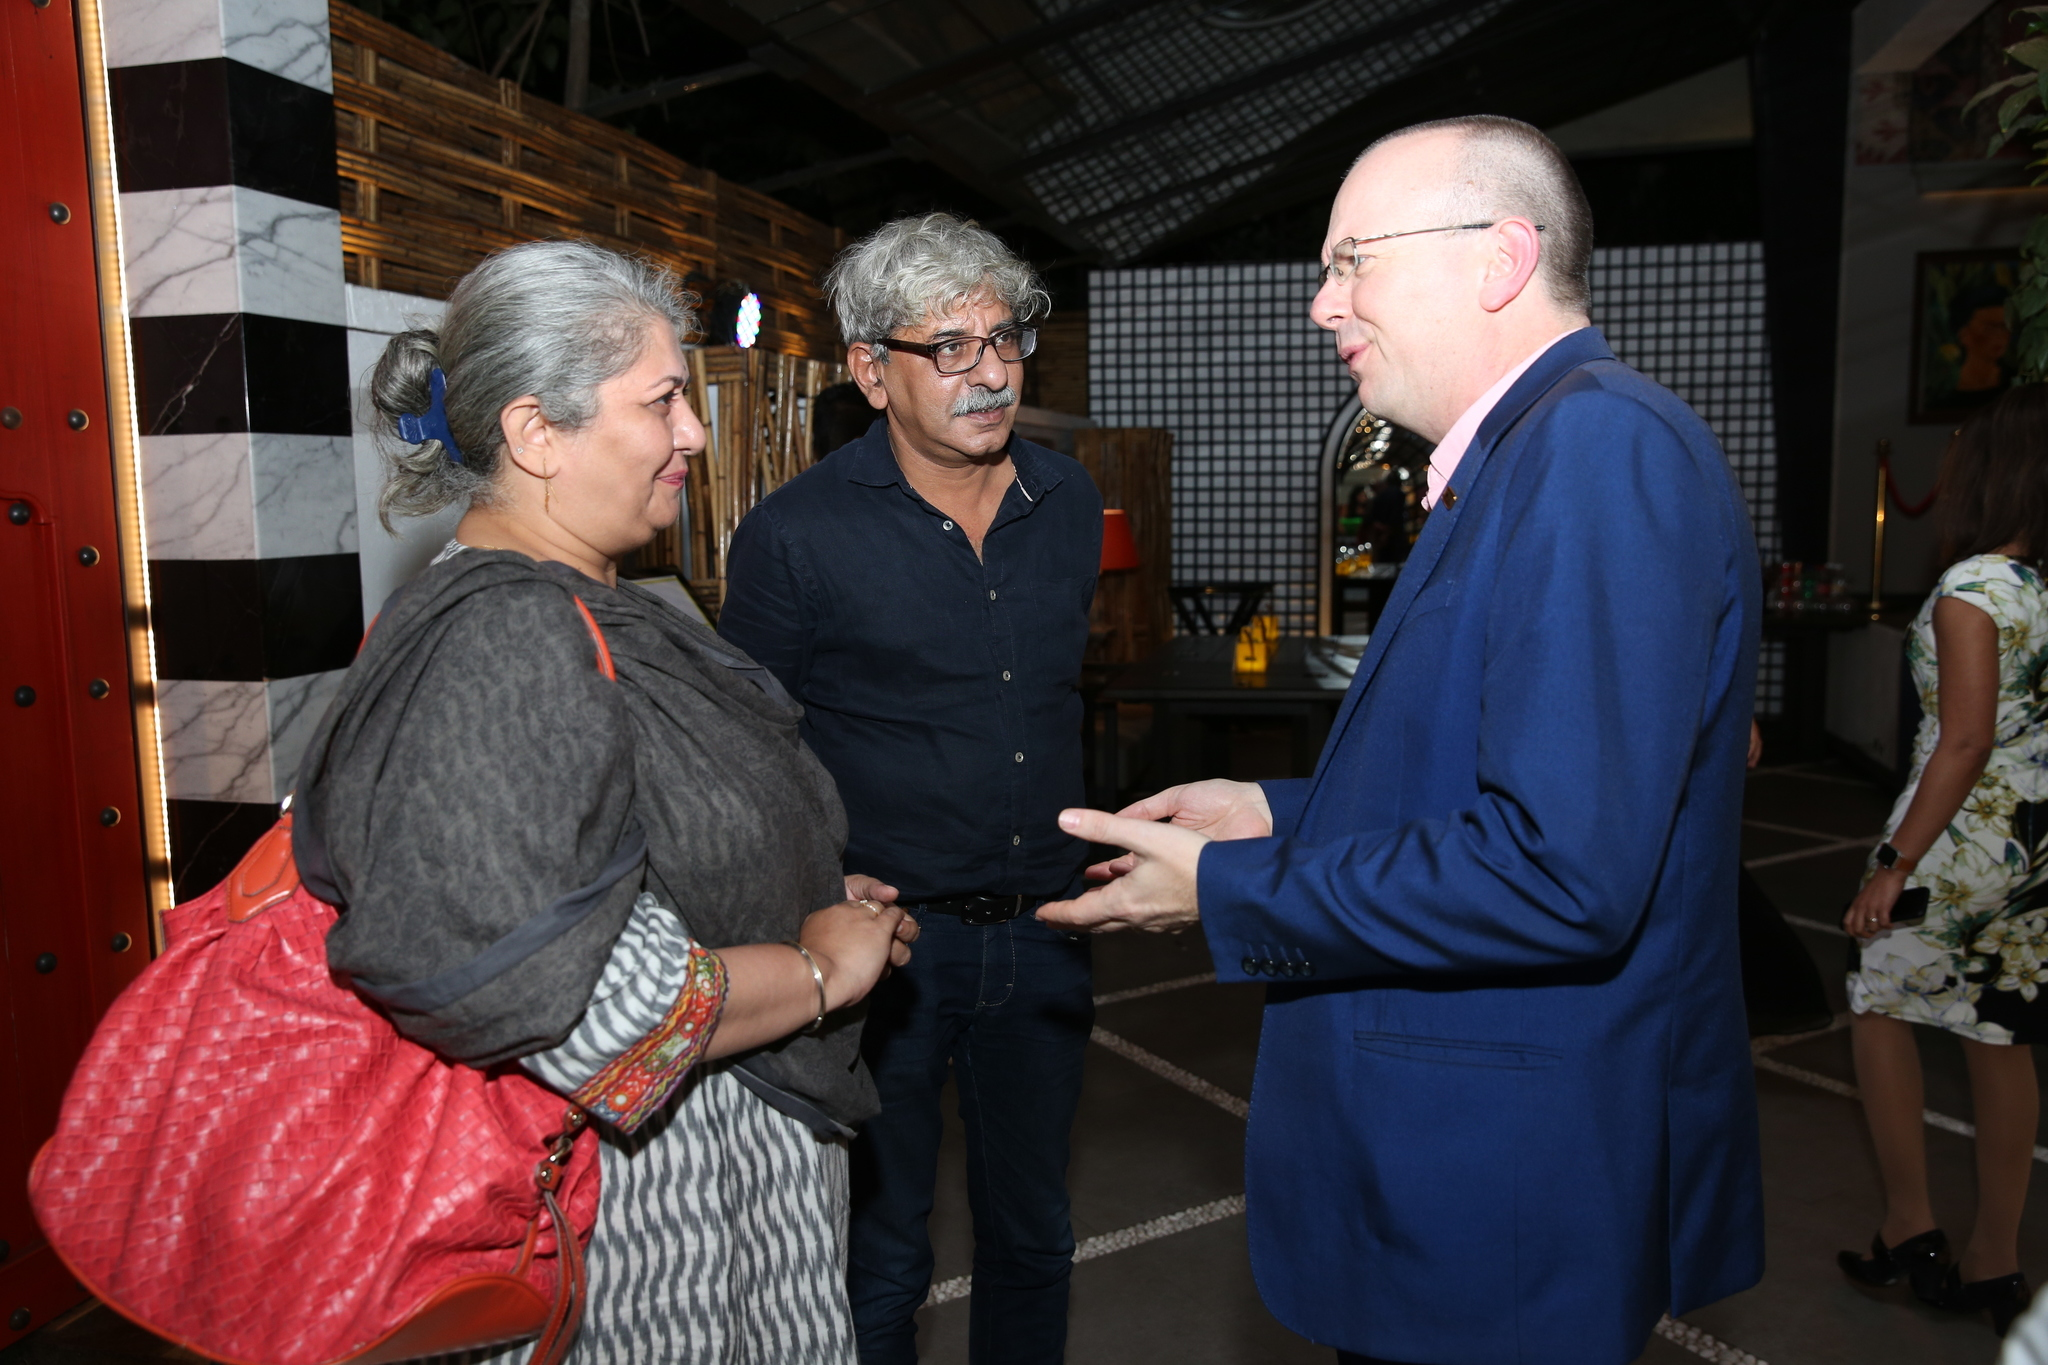 Col Needham and Sriram Raghavan